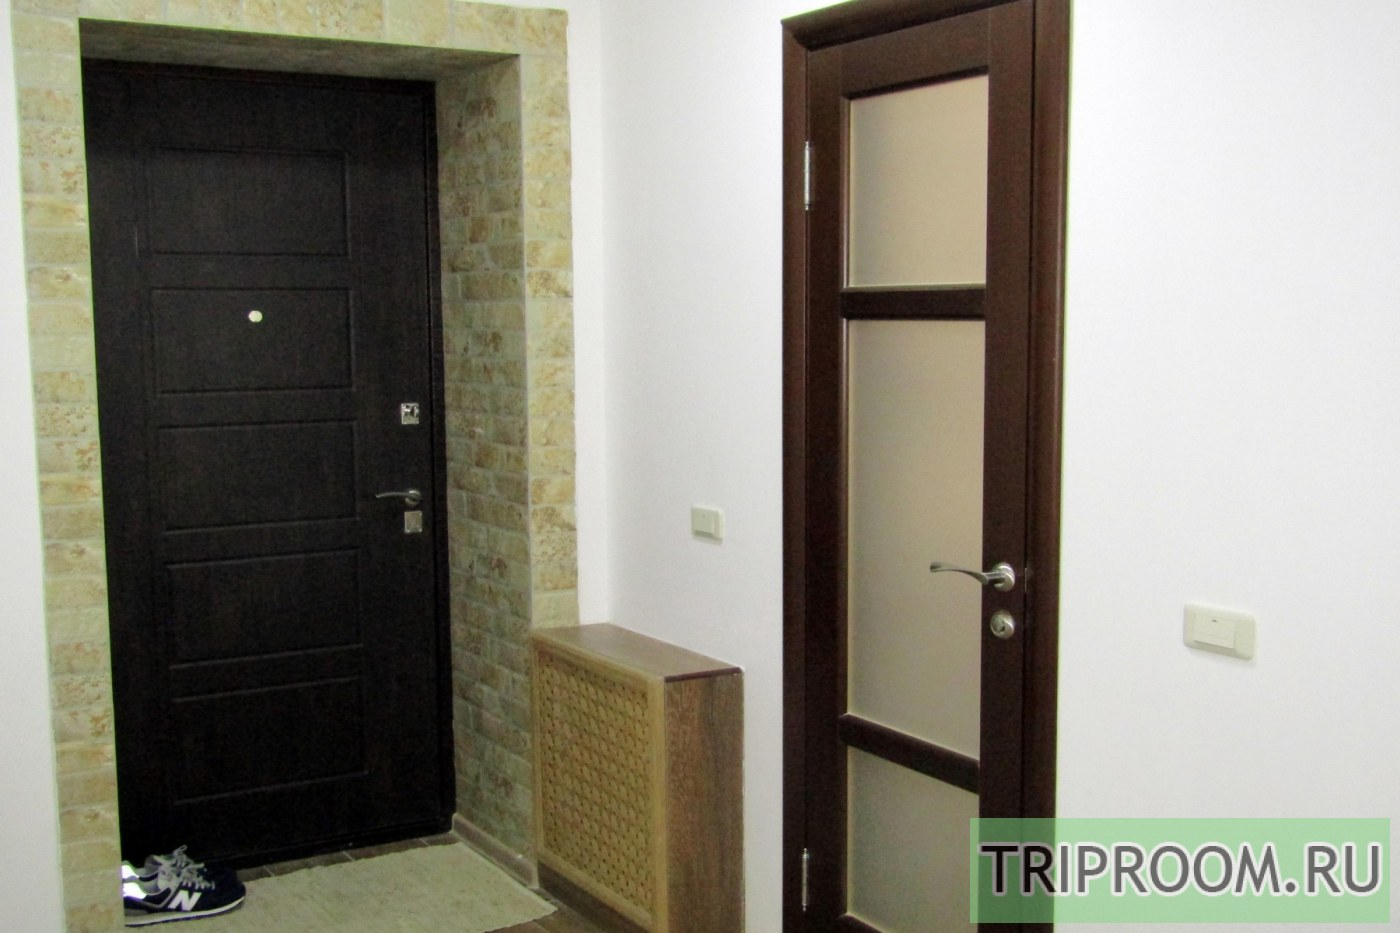 1-комнатная квартира посуточно (вариант № 37389), ул. Лозицкой улица, фото № 10